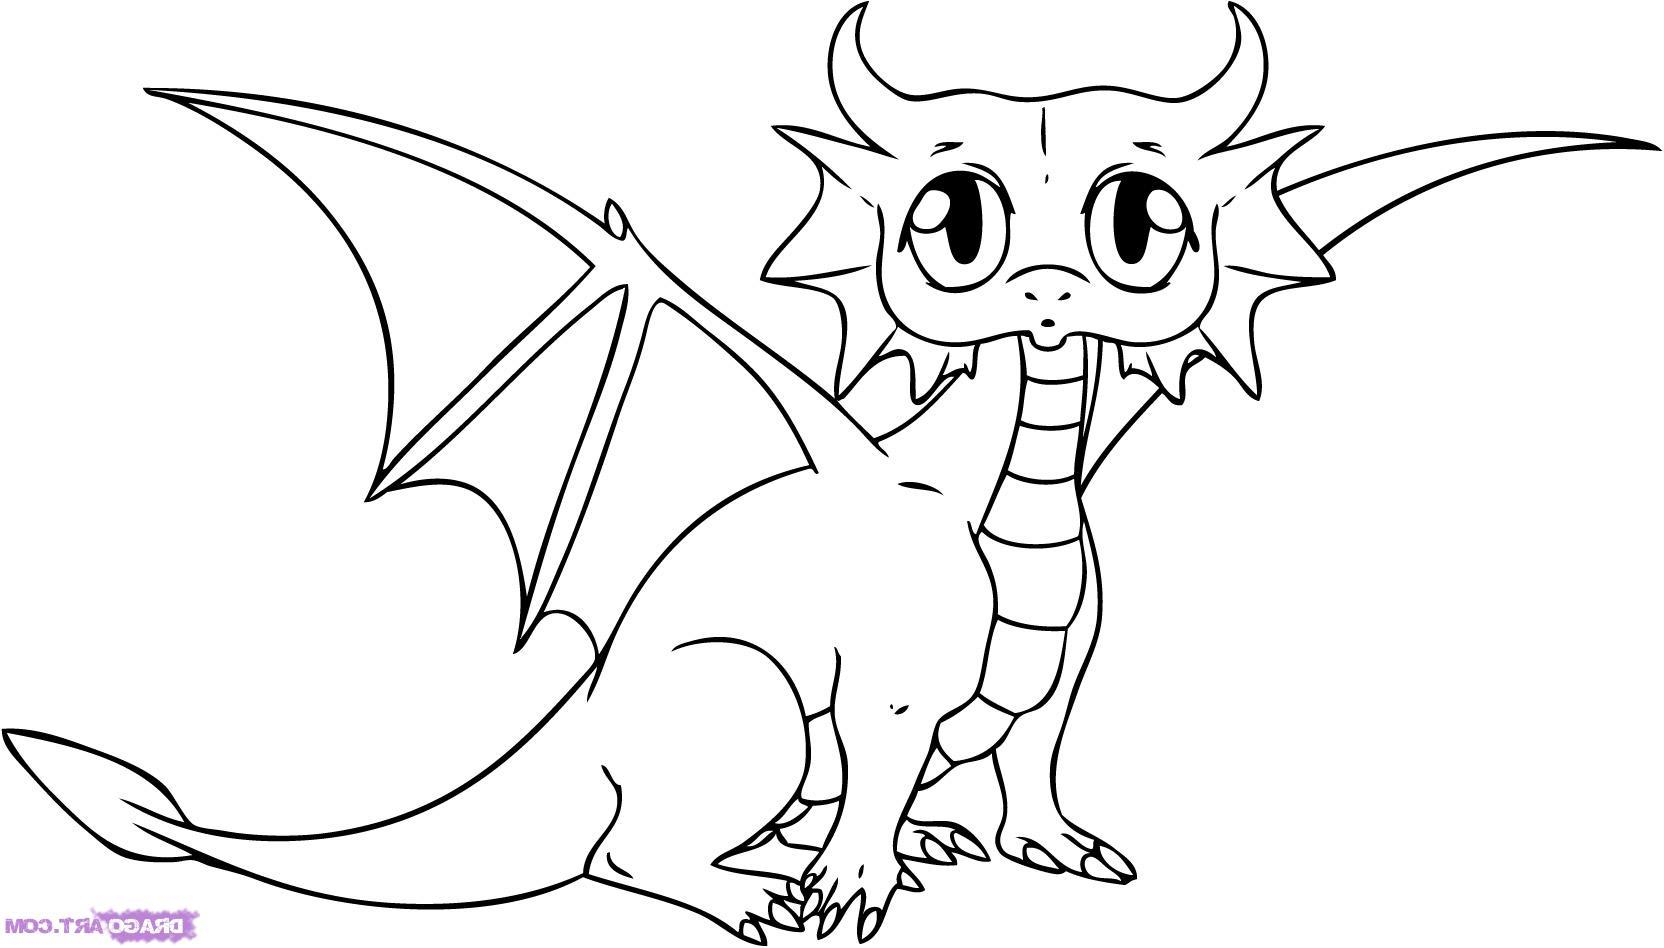 1664x948 Cartoon Dragon Drawing Best 15 How To Draw Cartoon Dragon Step